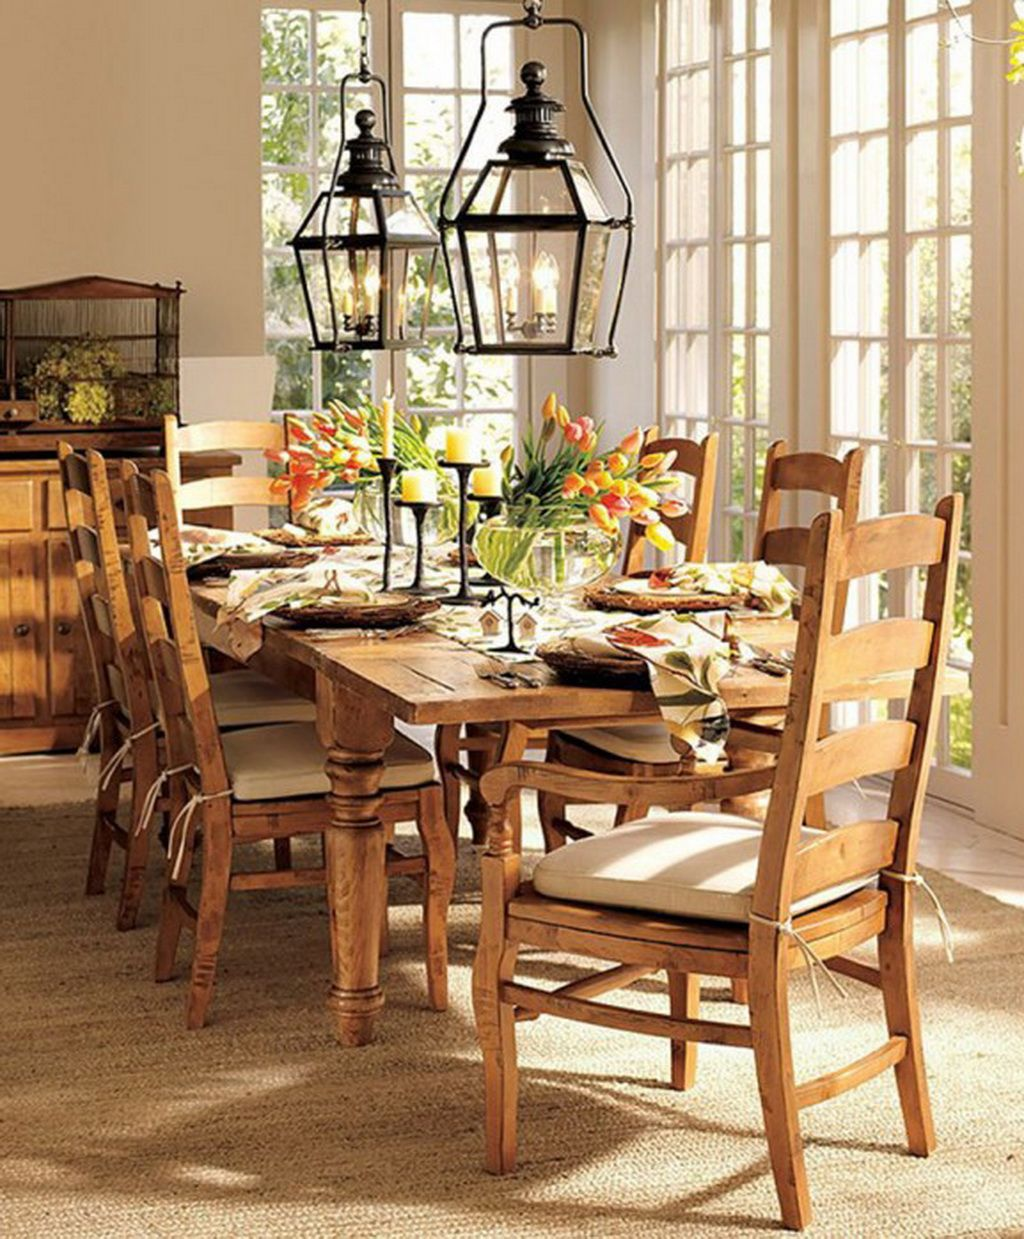 Simple Pottery Barn Kitchen Table Set Rectangular Maple Wood